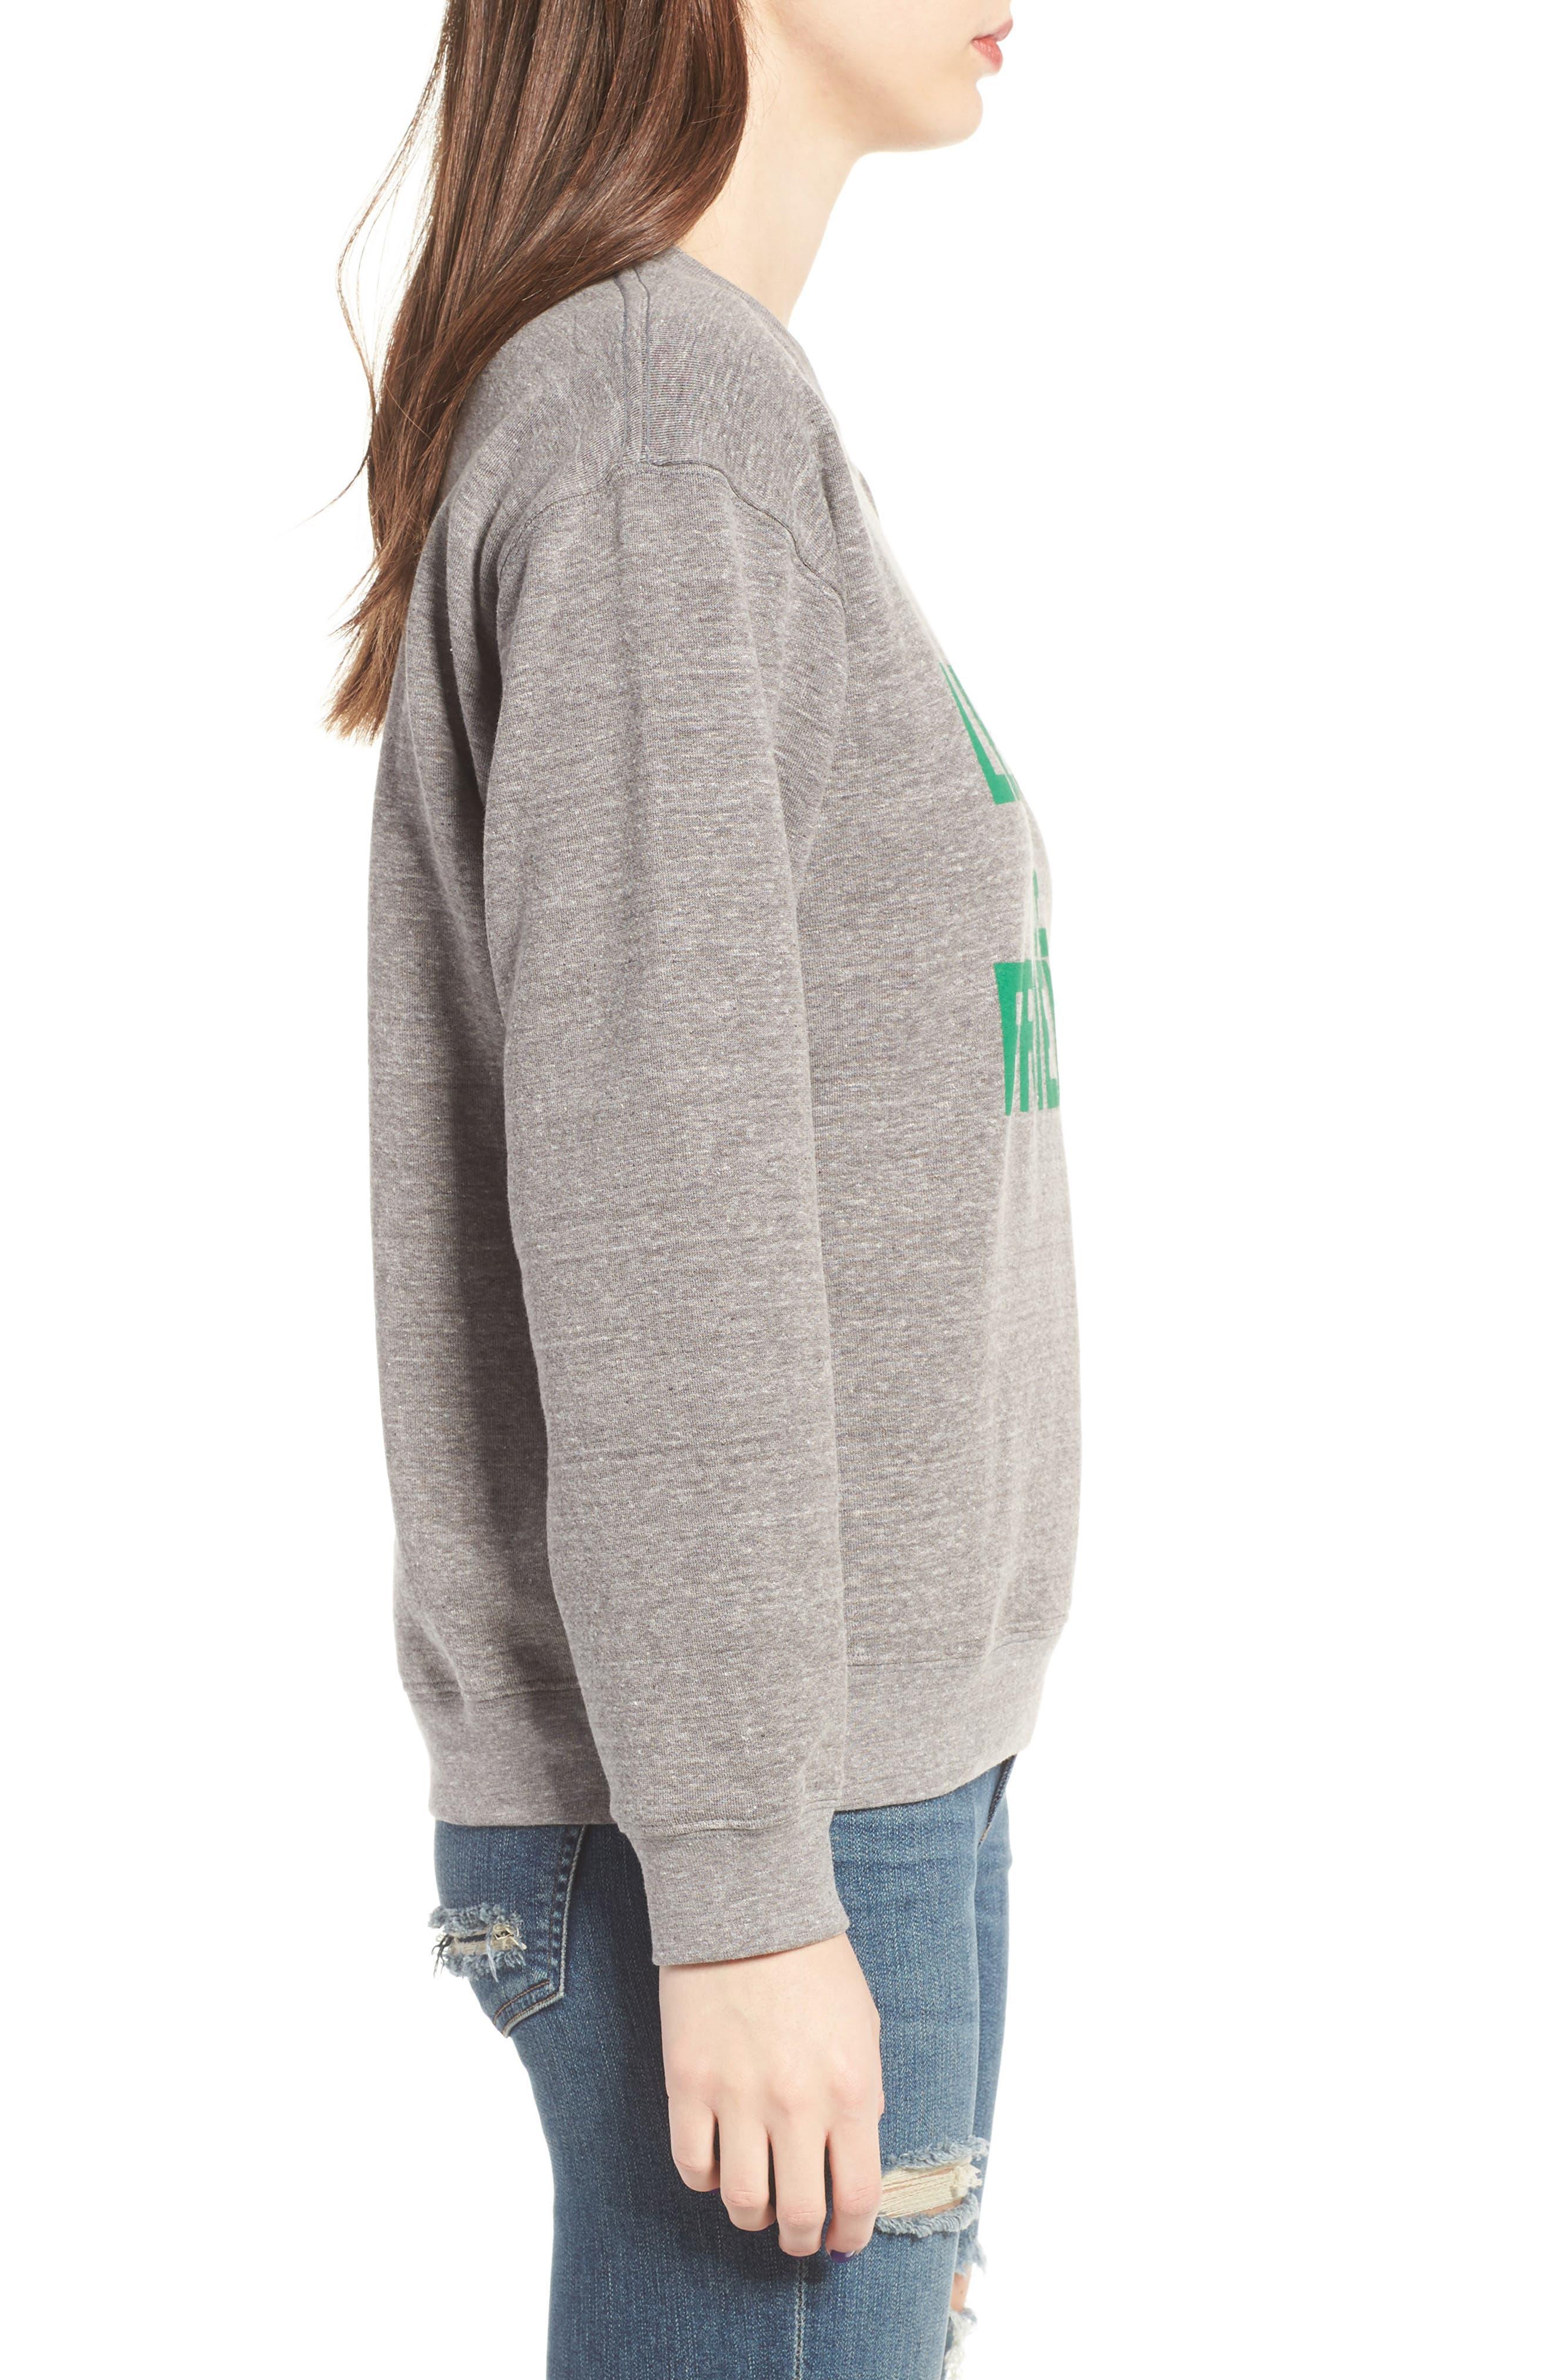 Lettuce Be Friends Sweatshirt,                             Alternate thumbnail 3, color,                             Heather Grey